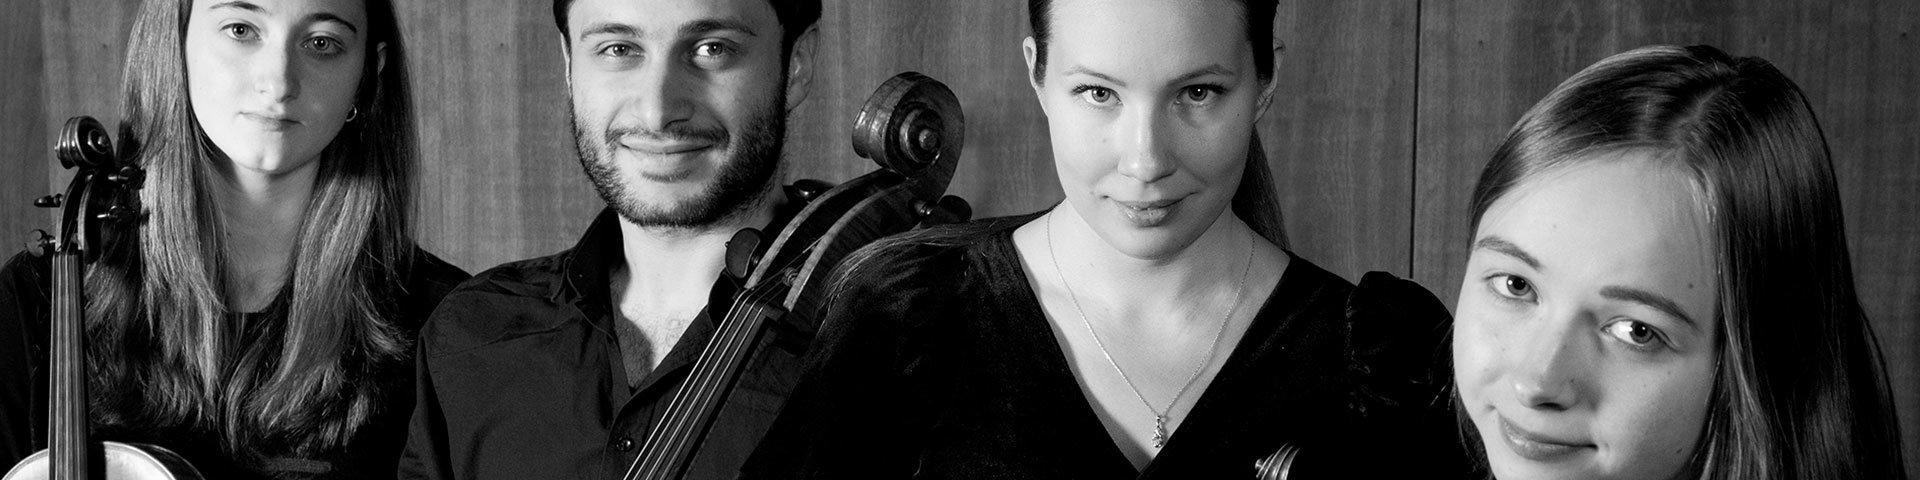 Cuarteto Mendelssohn de BP and Samuel Palomino